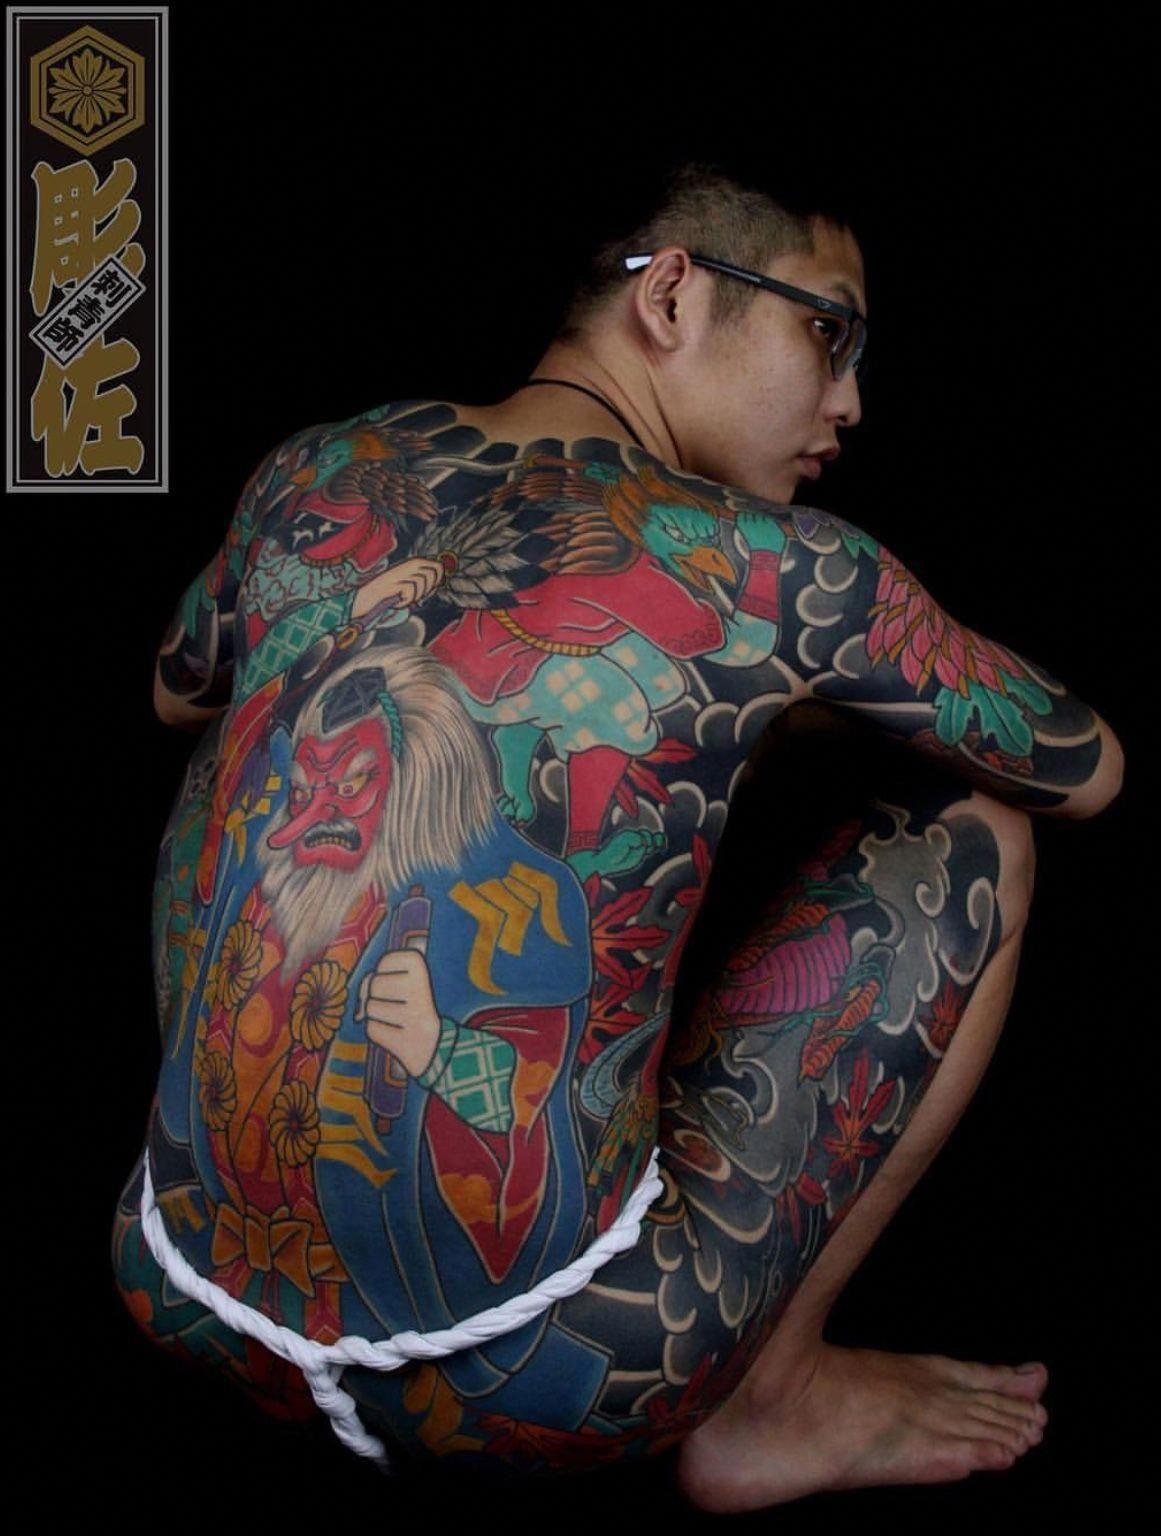 350+ Japanese Yakuza Tattoos With Meanings and History (2021) Irezumi Designs